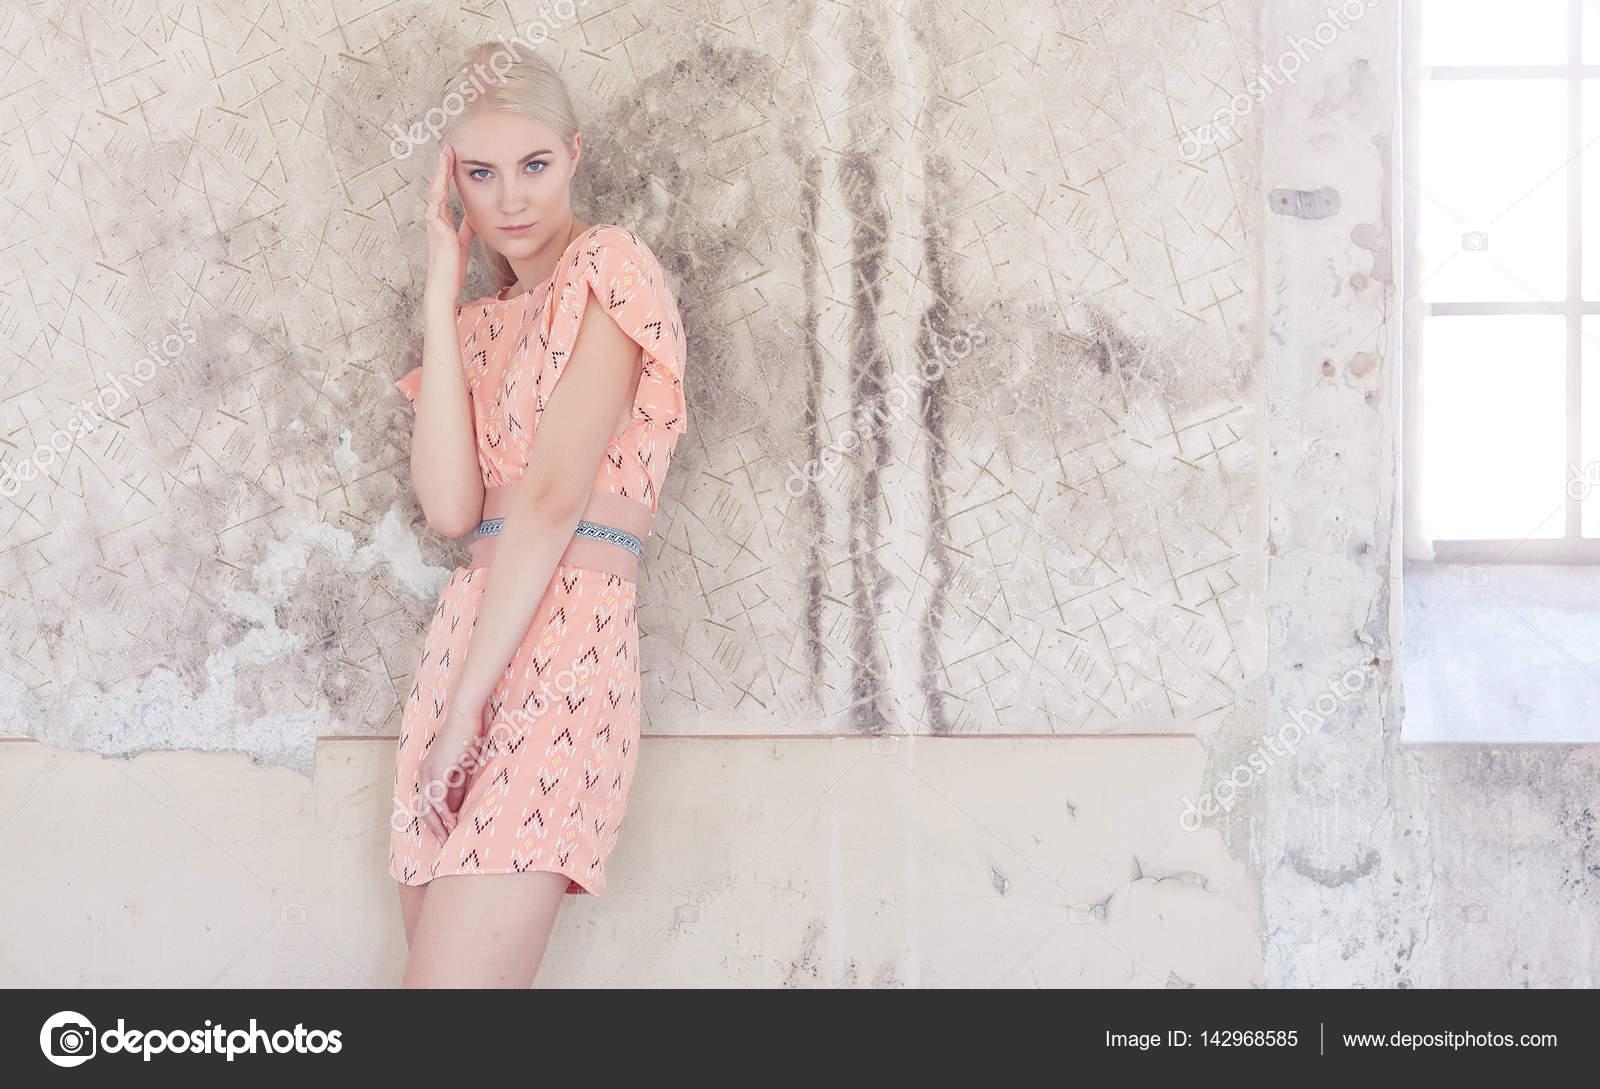 Licht Roze Jurk : Blonde vrouw in een licht roze jurk u stockfoto fxquadro